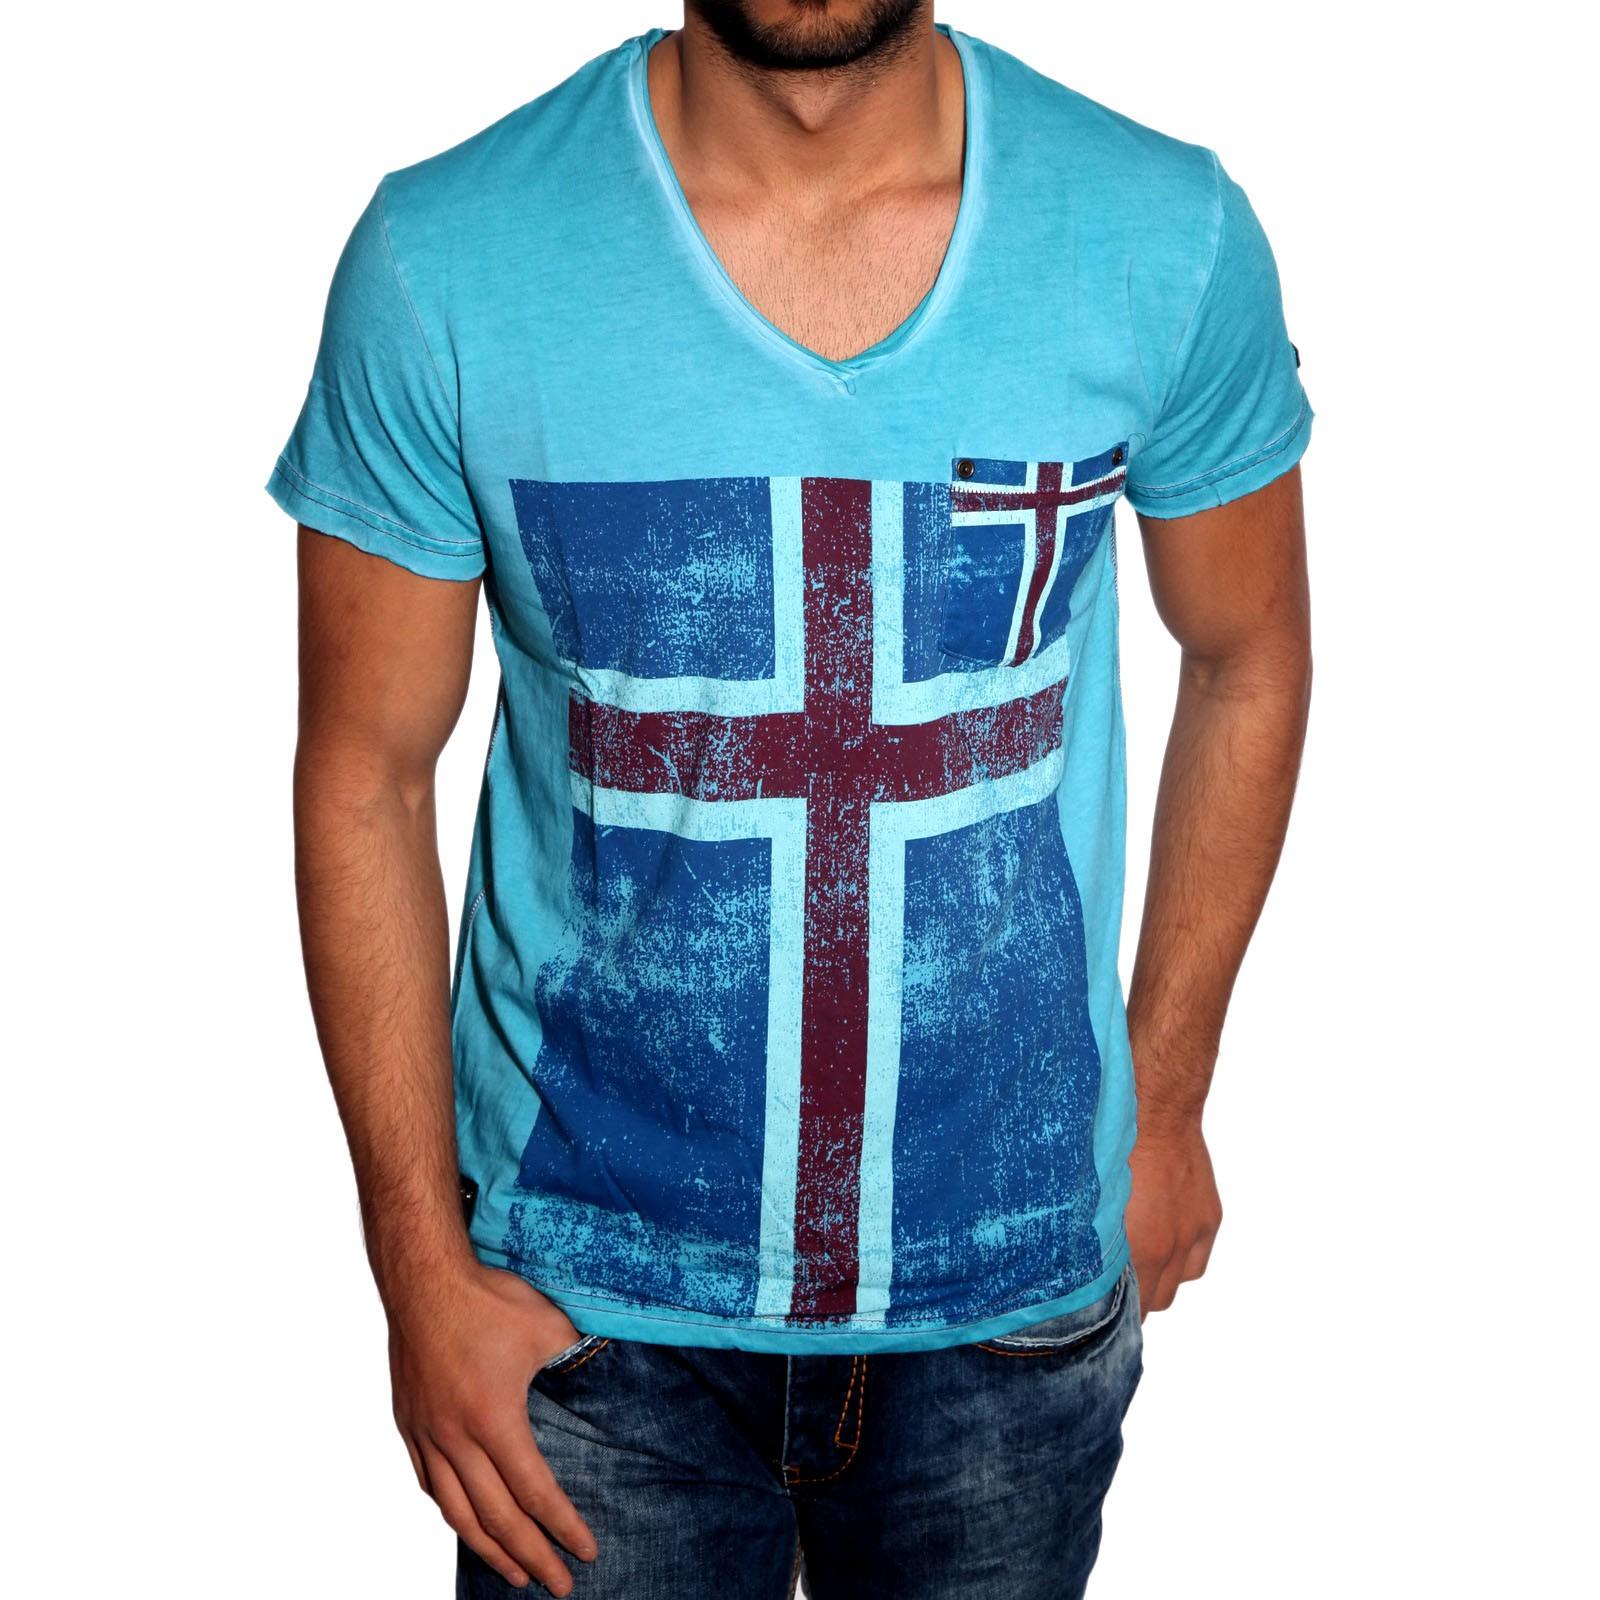 T-Shirt Türkis 6640 R-Neal